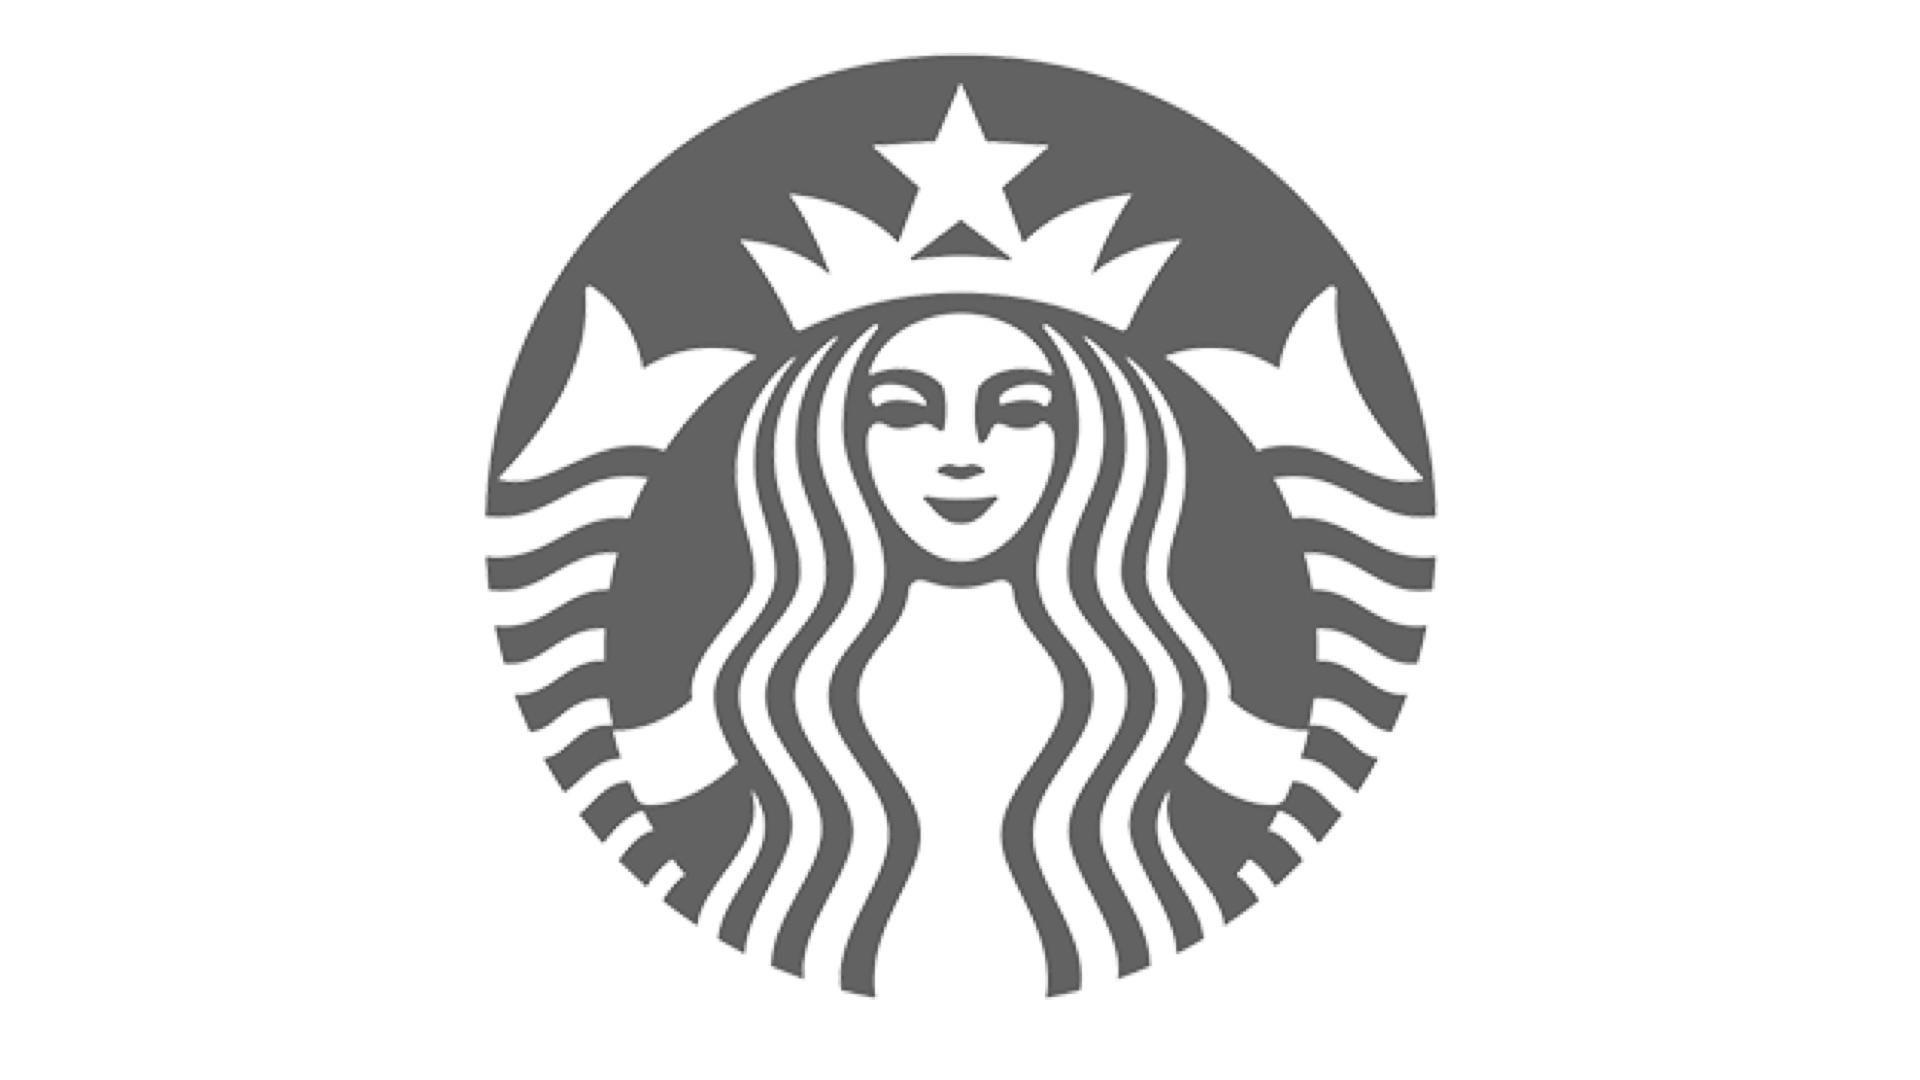 CDS 2017 logos.001.jpeg